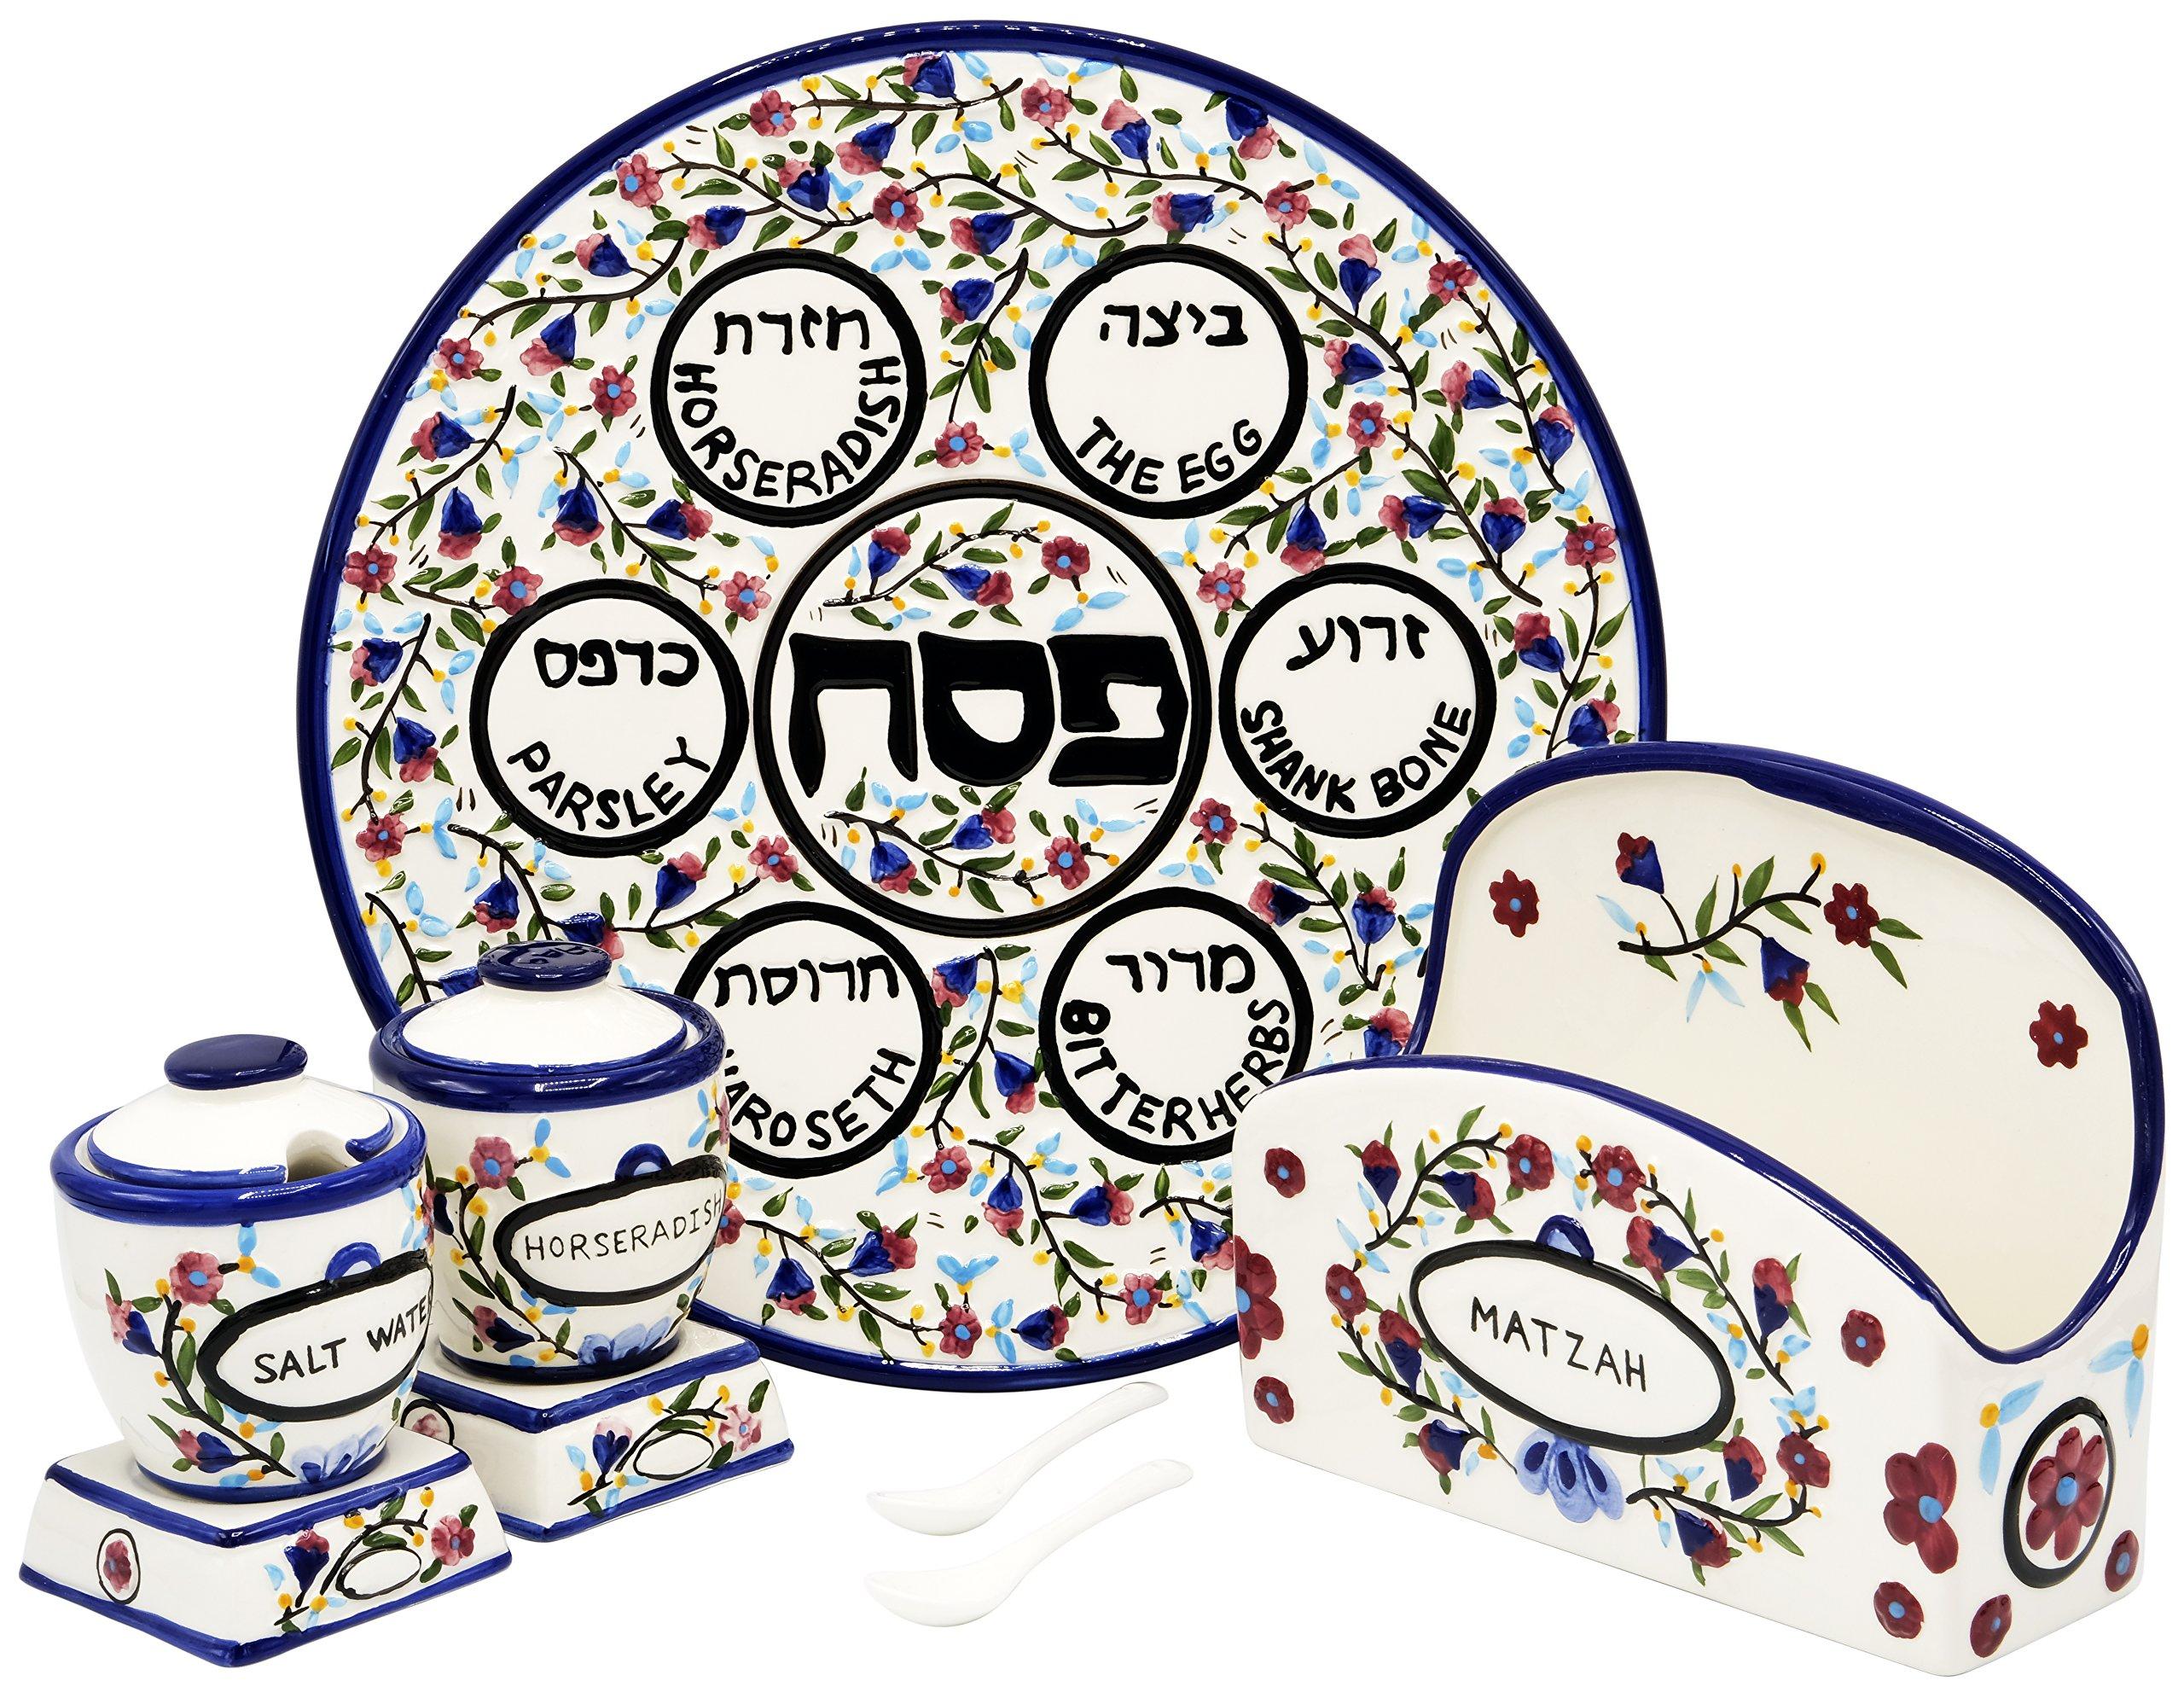 Passover Ceramic 12'' Blue, White, Red, And Yellow Seder Plate, Matzah Holder, & Salt Water + Horseradish Set - Armenian Design (Complete Passover Set)